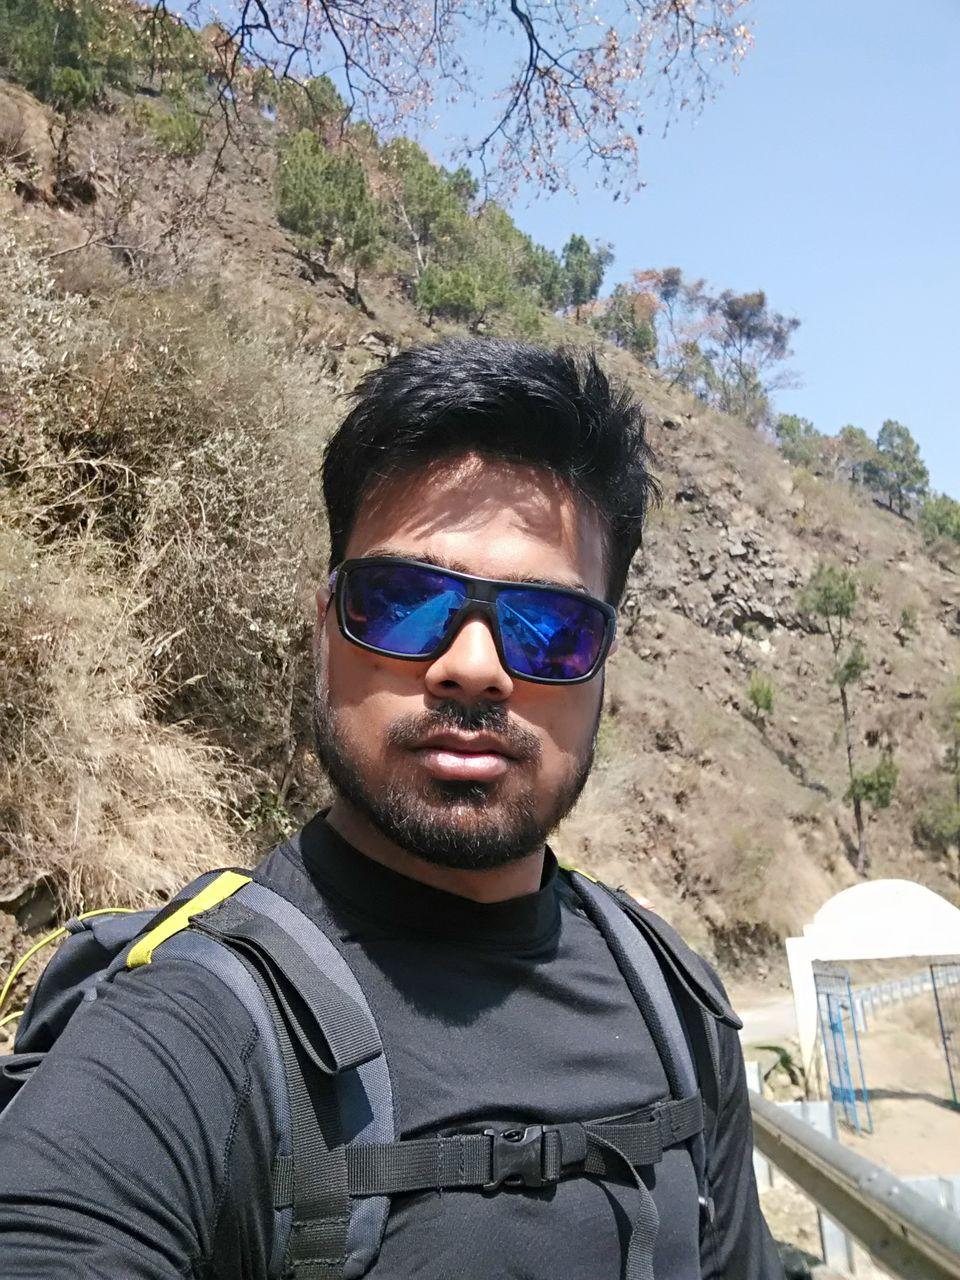 Prashar Lake - Hidden Jewel of Himachal